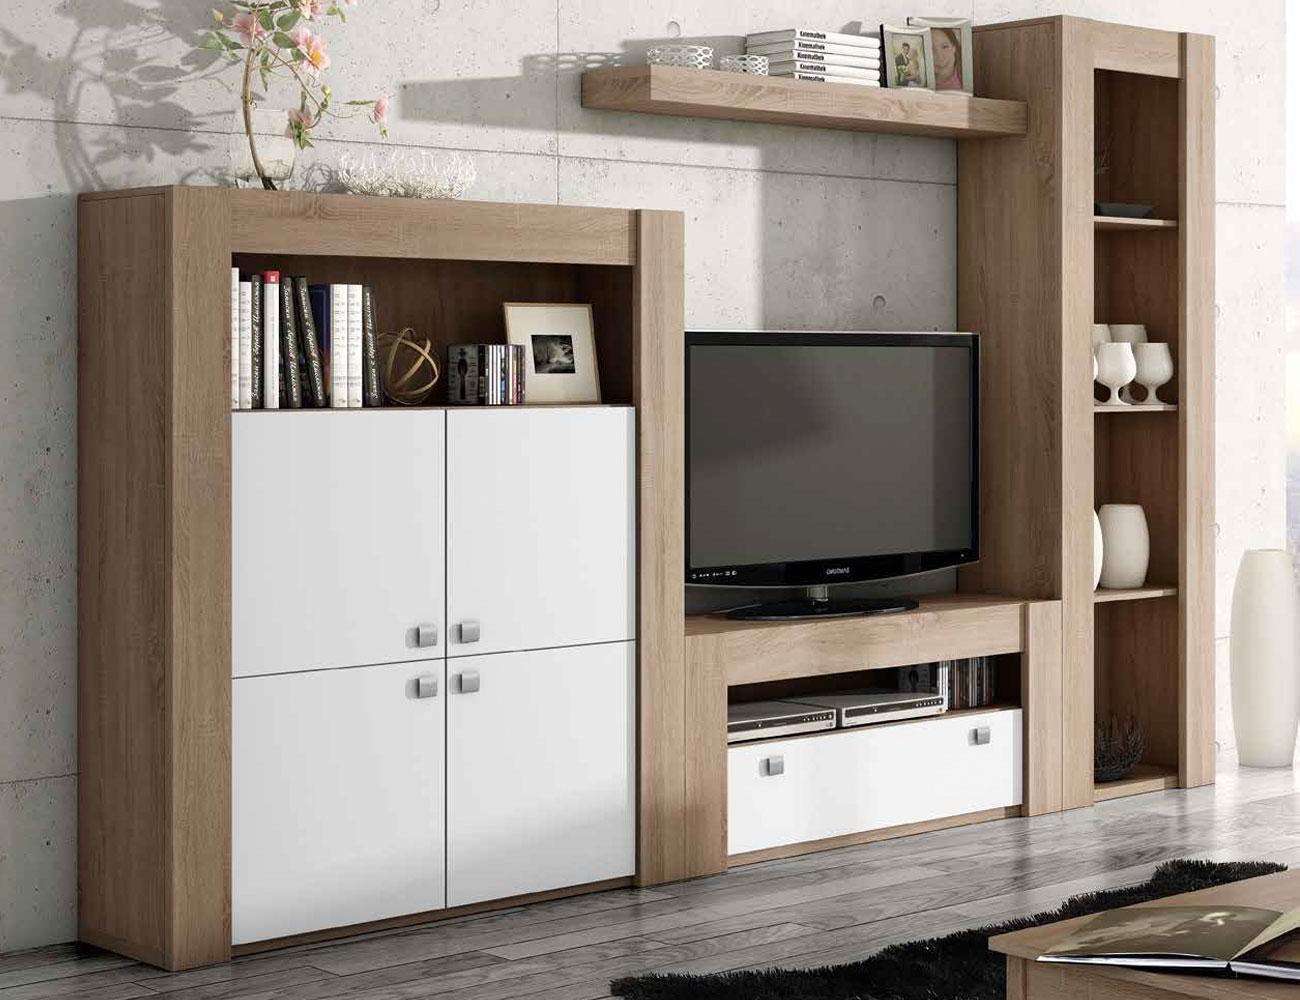 Mueble salon moderno comp03a